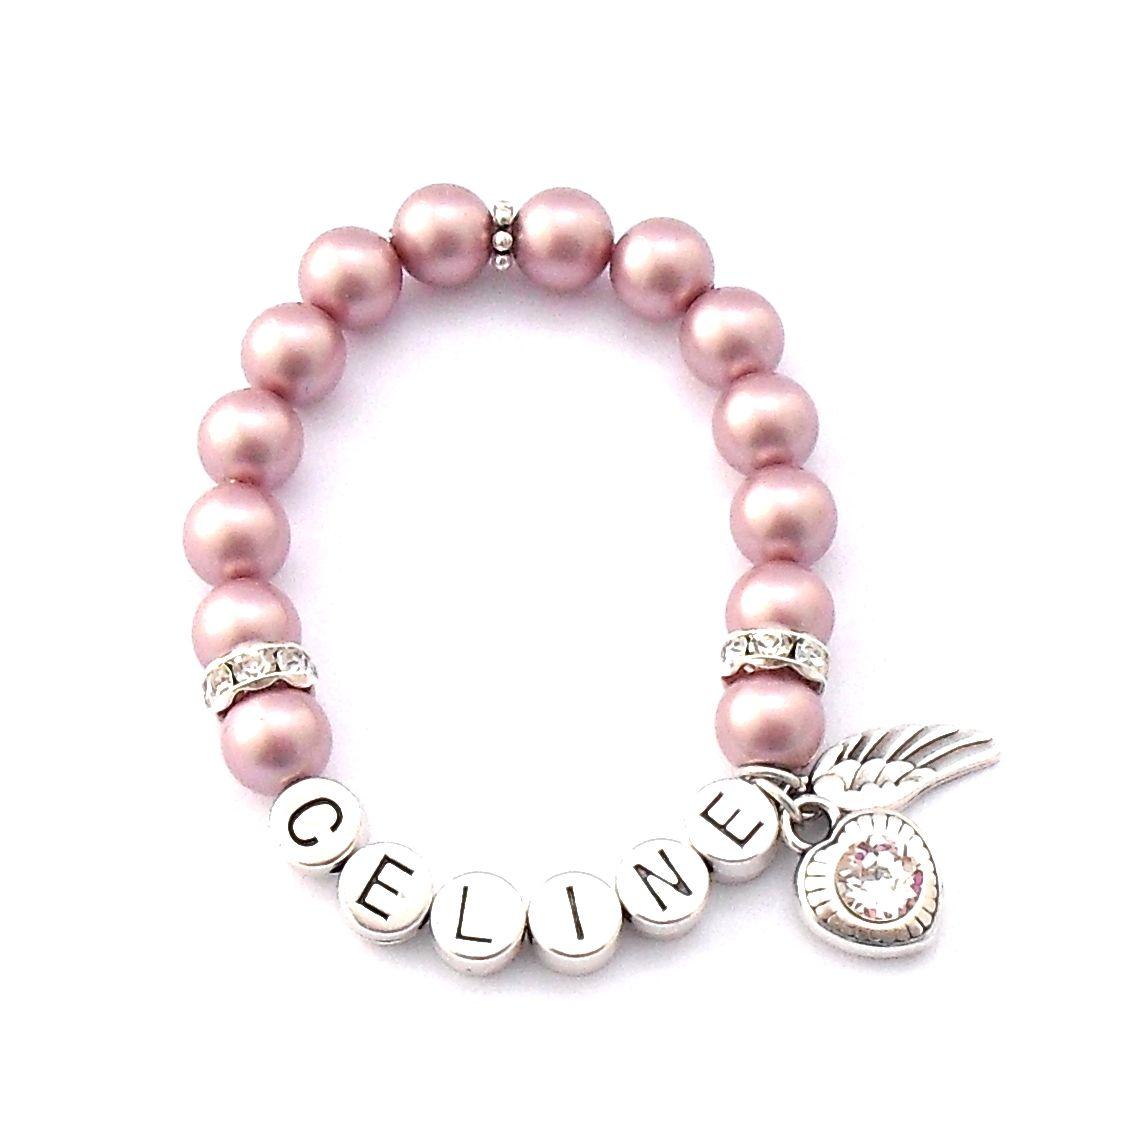 Kinderarmband Mit Namen Bei Sr Jewelry Kaufen Namensarmband